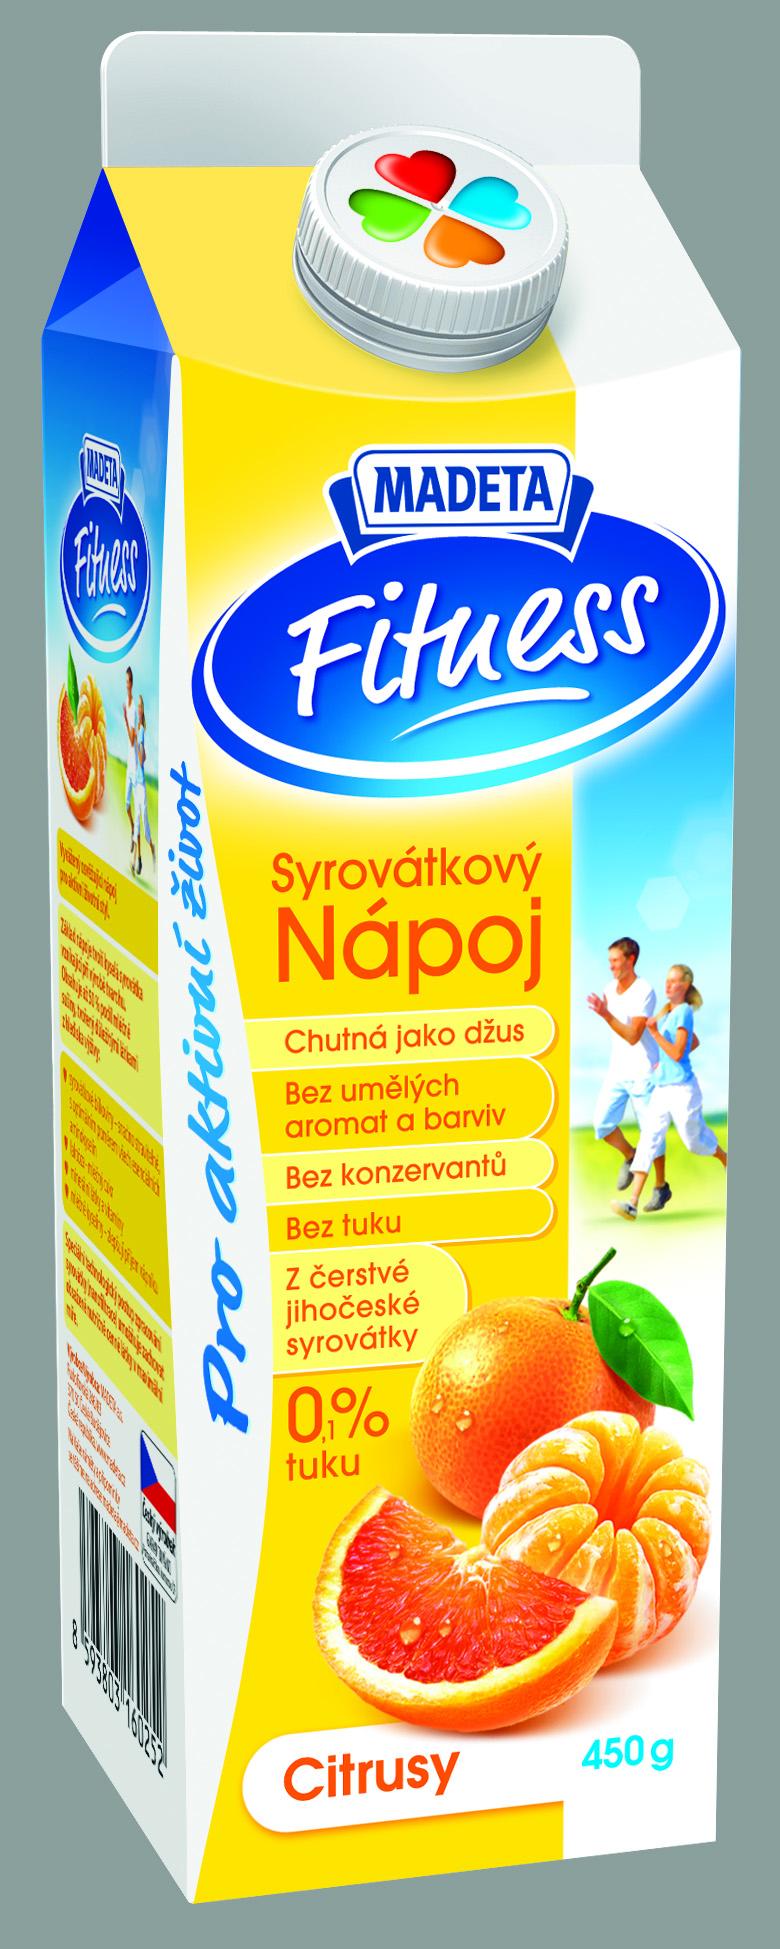 Značka Syrovátkový nápoj citrusy